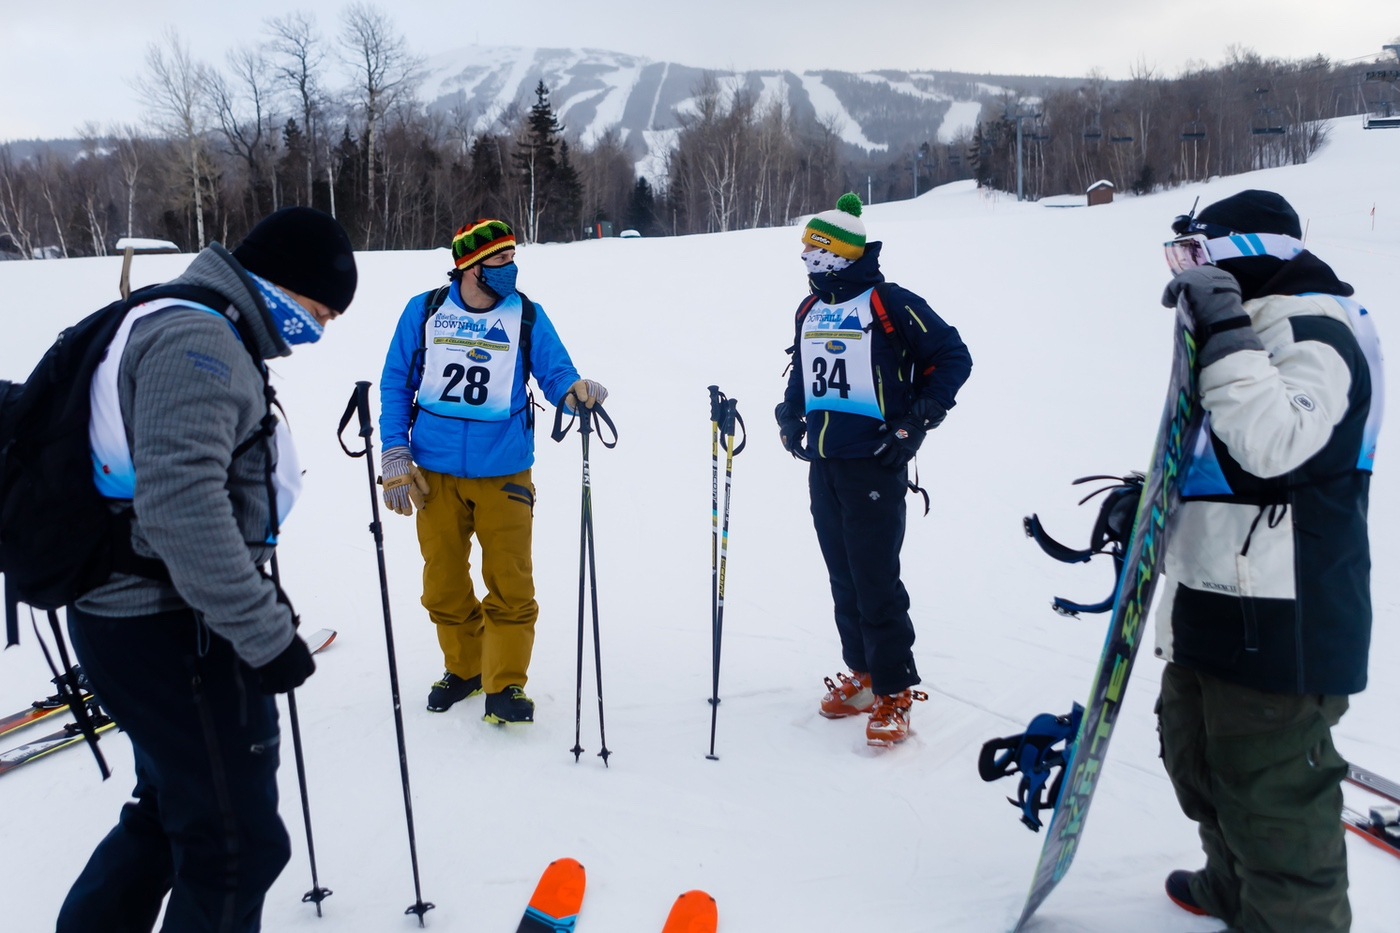 WinterKids Downhill 24 2021 SDP 3576